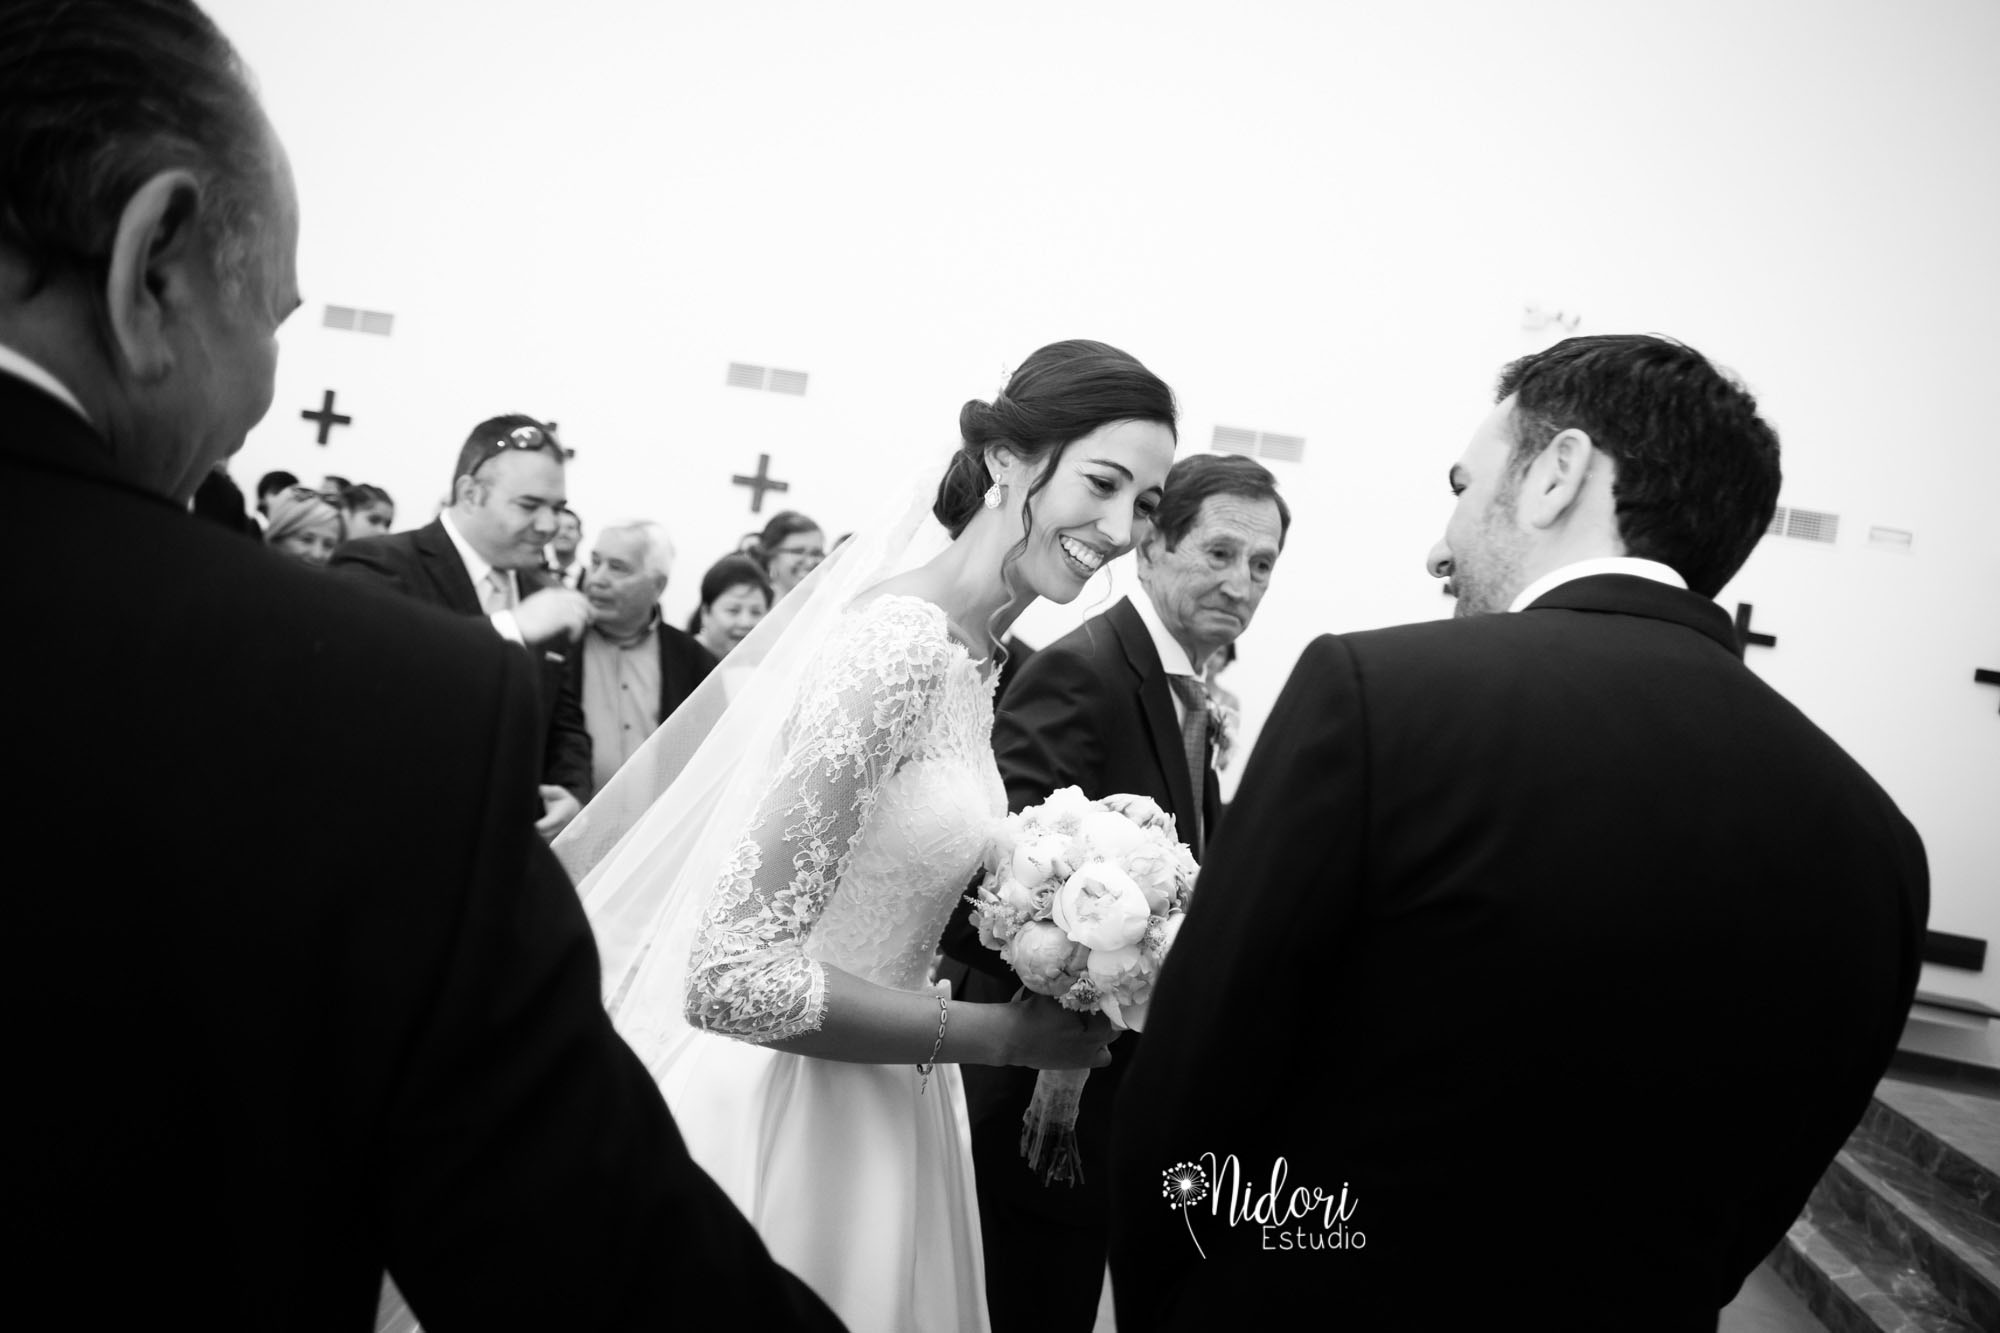 fotos-de-boda-reportaje-novios-fotografia-boda-nidoriestudio-fotos-valencia-almazora-castellon-españa-spain-042